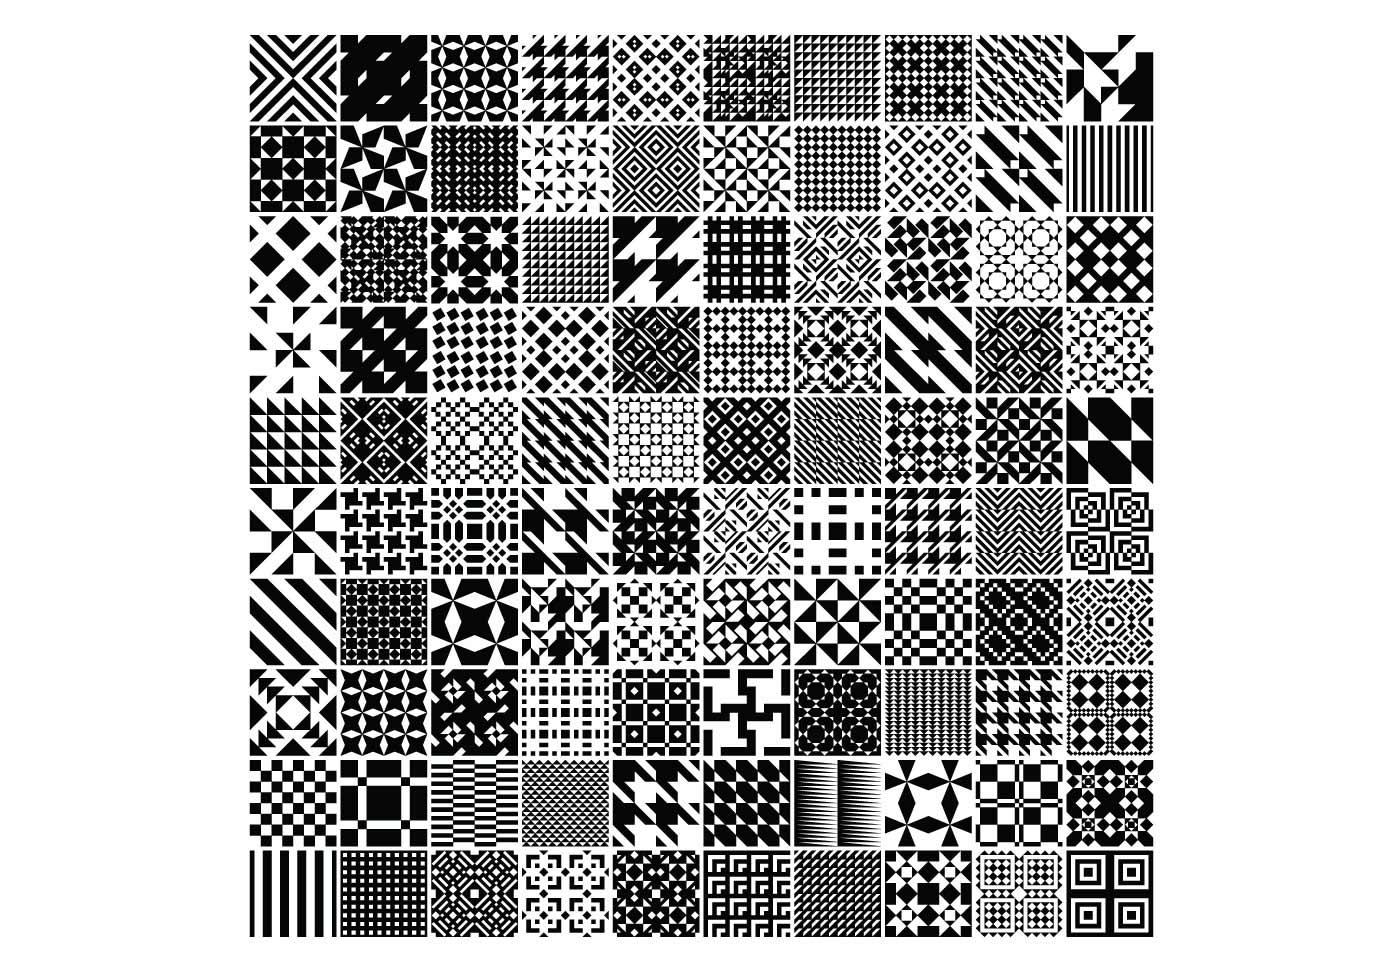 Pattern Vector Pack of 100 Creative Design Pattern Vectors